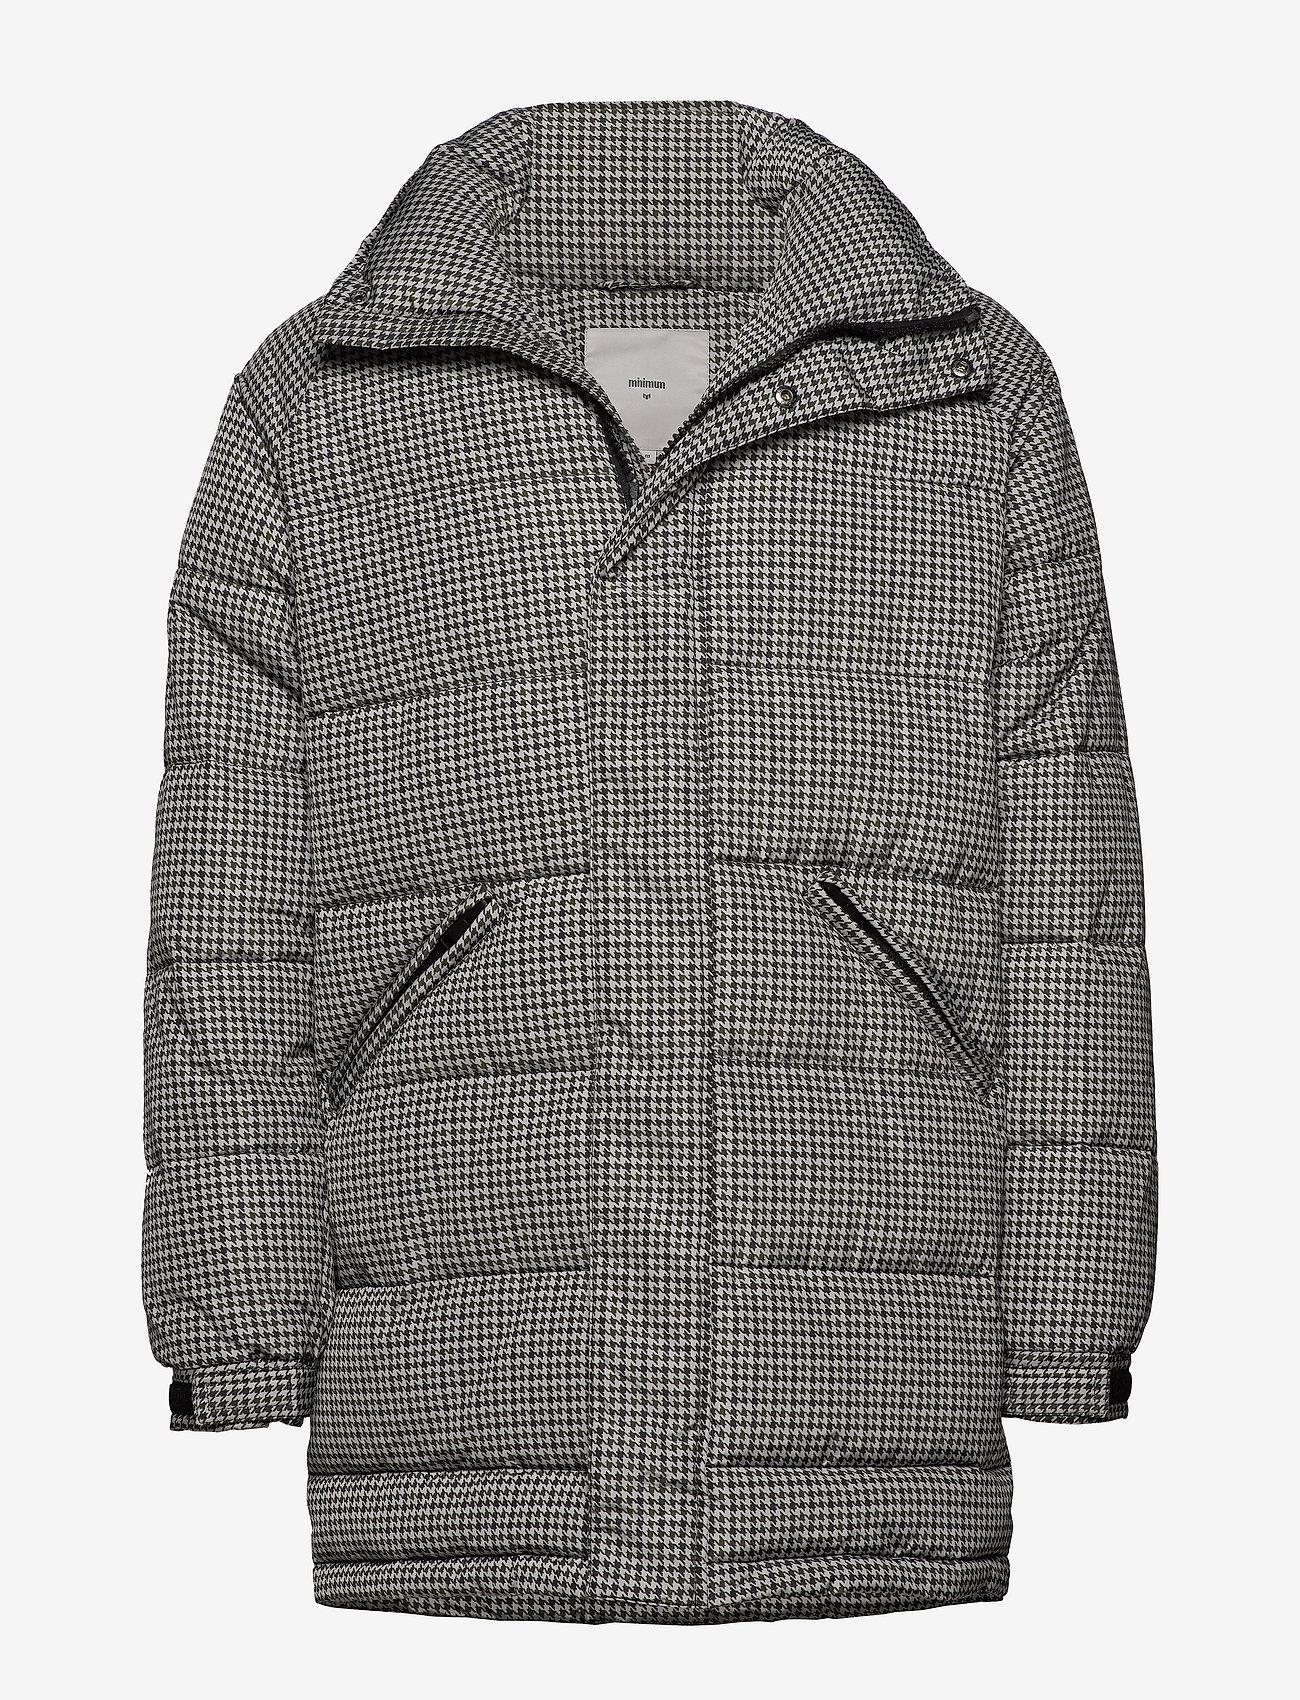 Minimum Lindgren - Jackets & Coats